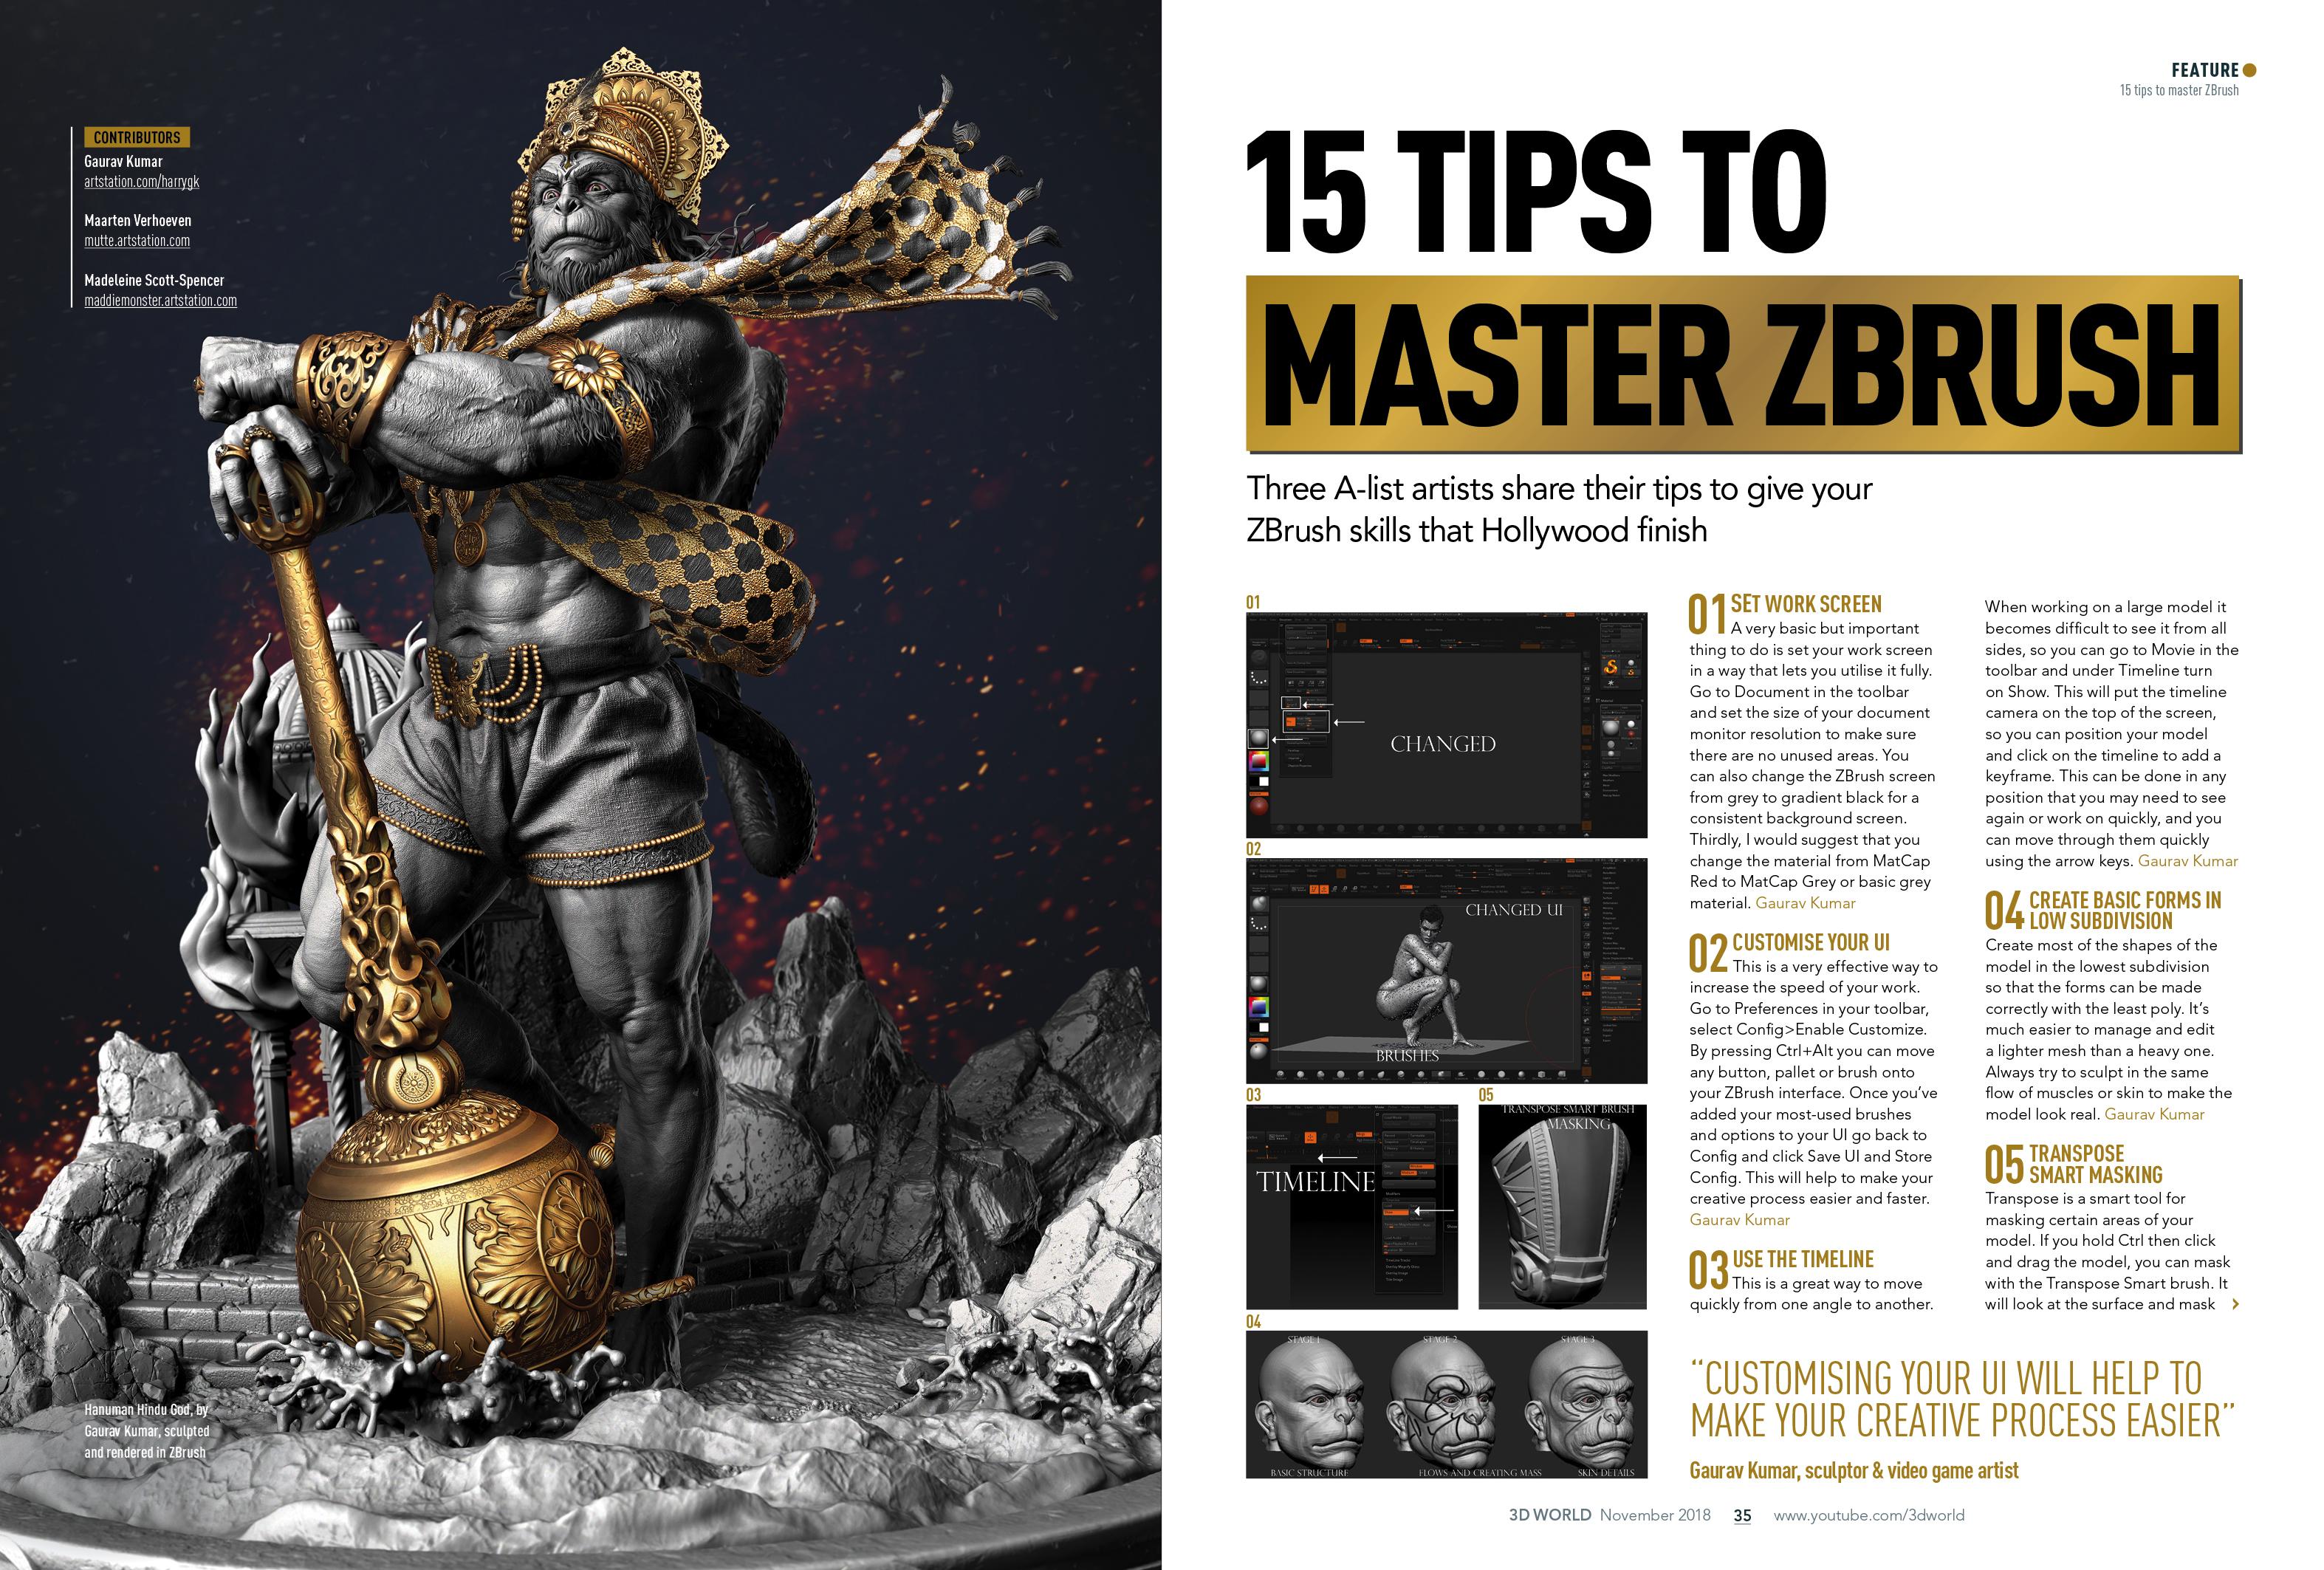 Master ZBrush digital sculpting with 3D World - Ειδήσεις από